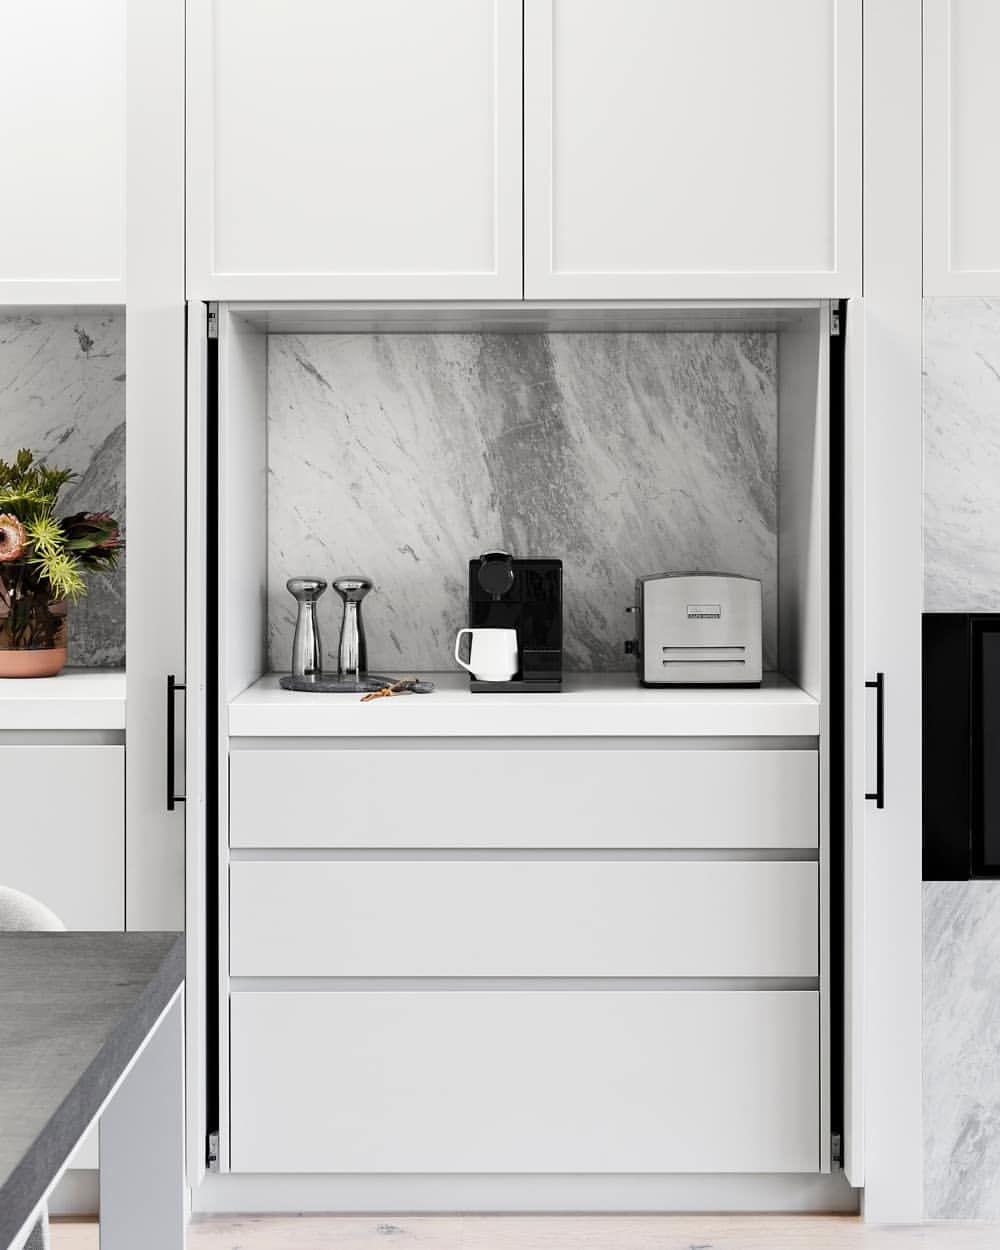 Kitchen Hack Retractable Doors For All Your Hide Away Needs Stkildaproject Giarenovations Retractable Door Kitchens And Bedrooms White Modern Kitchen